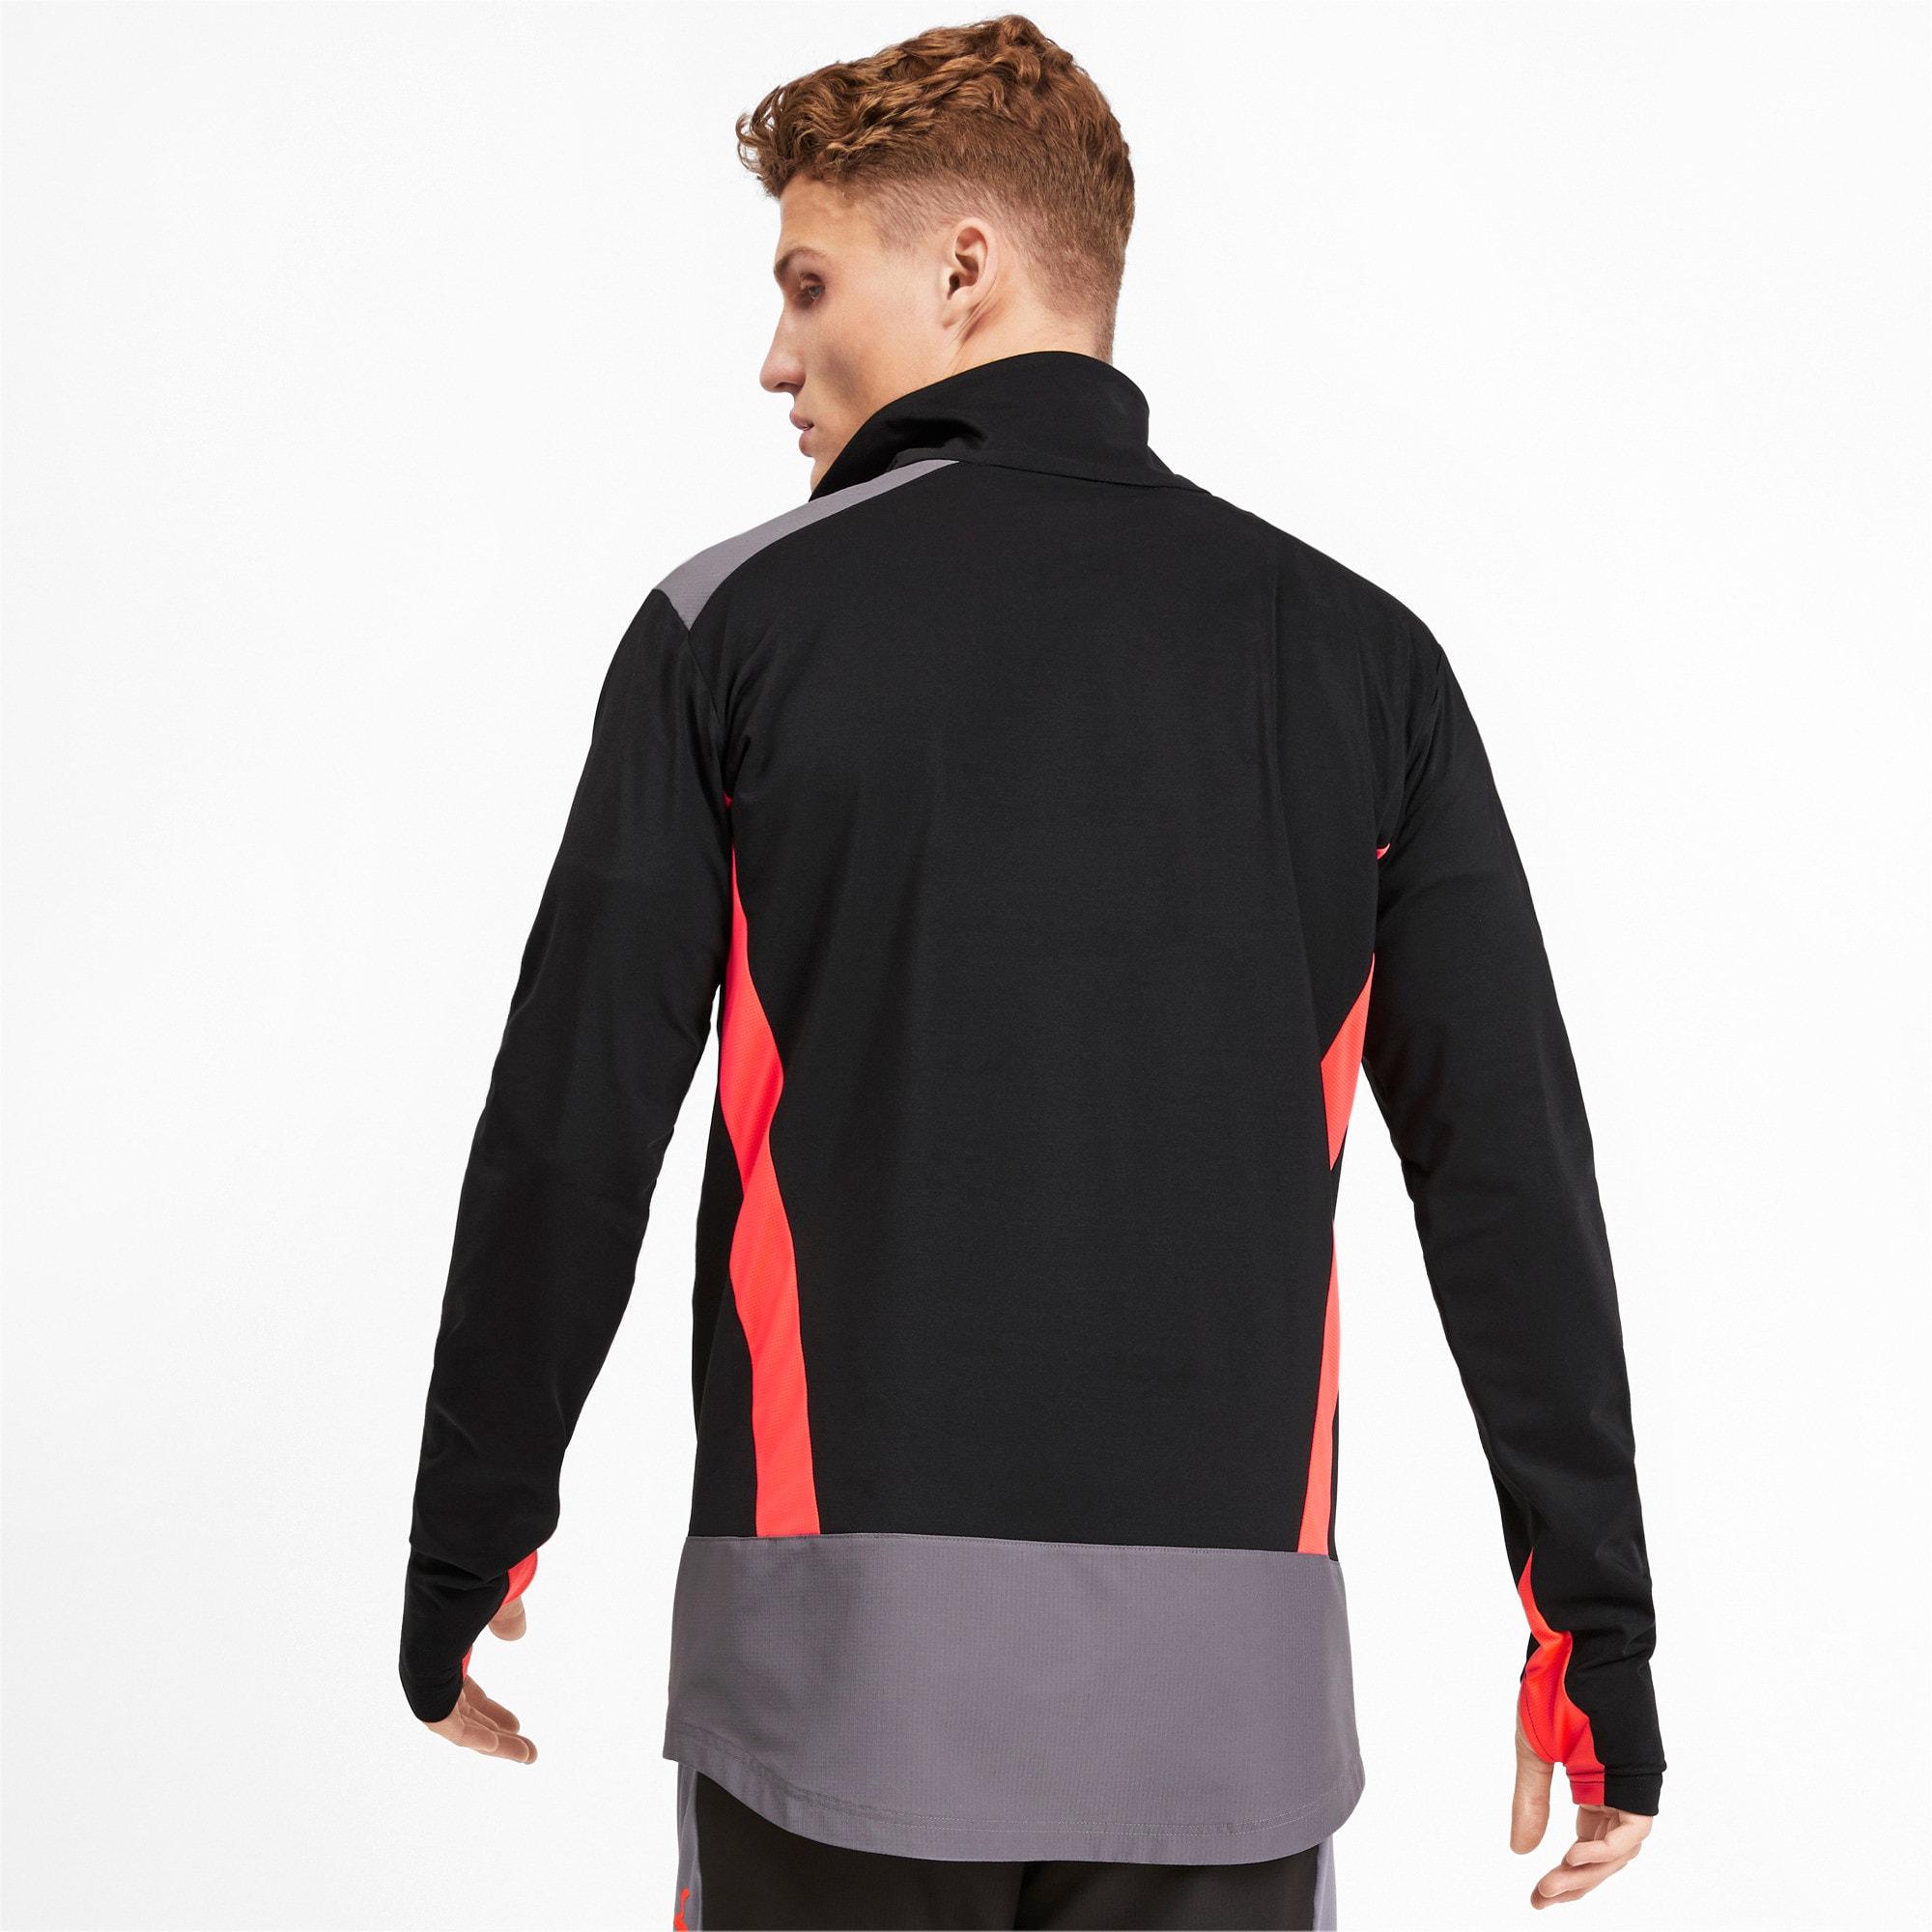 Thumbnail 2 of Quarter Zip Men's Top, Puma Black-Nrgy Red, medium